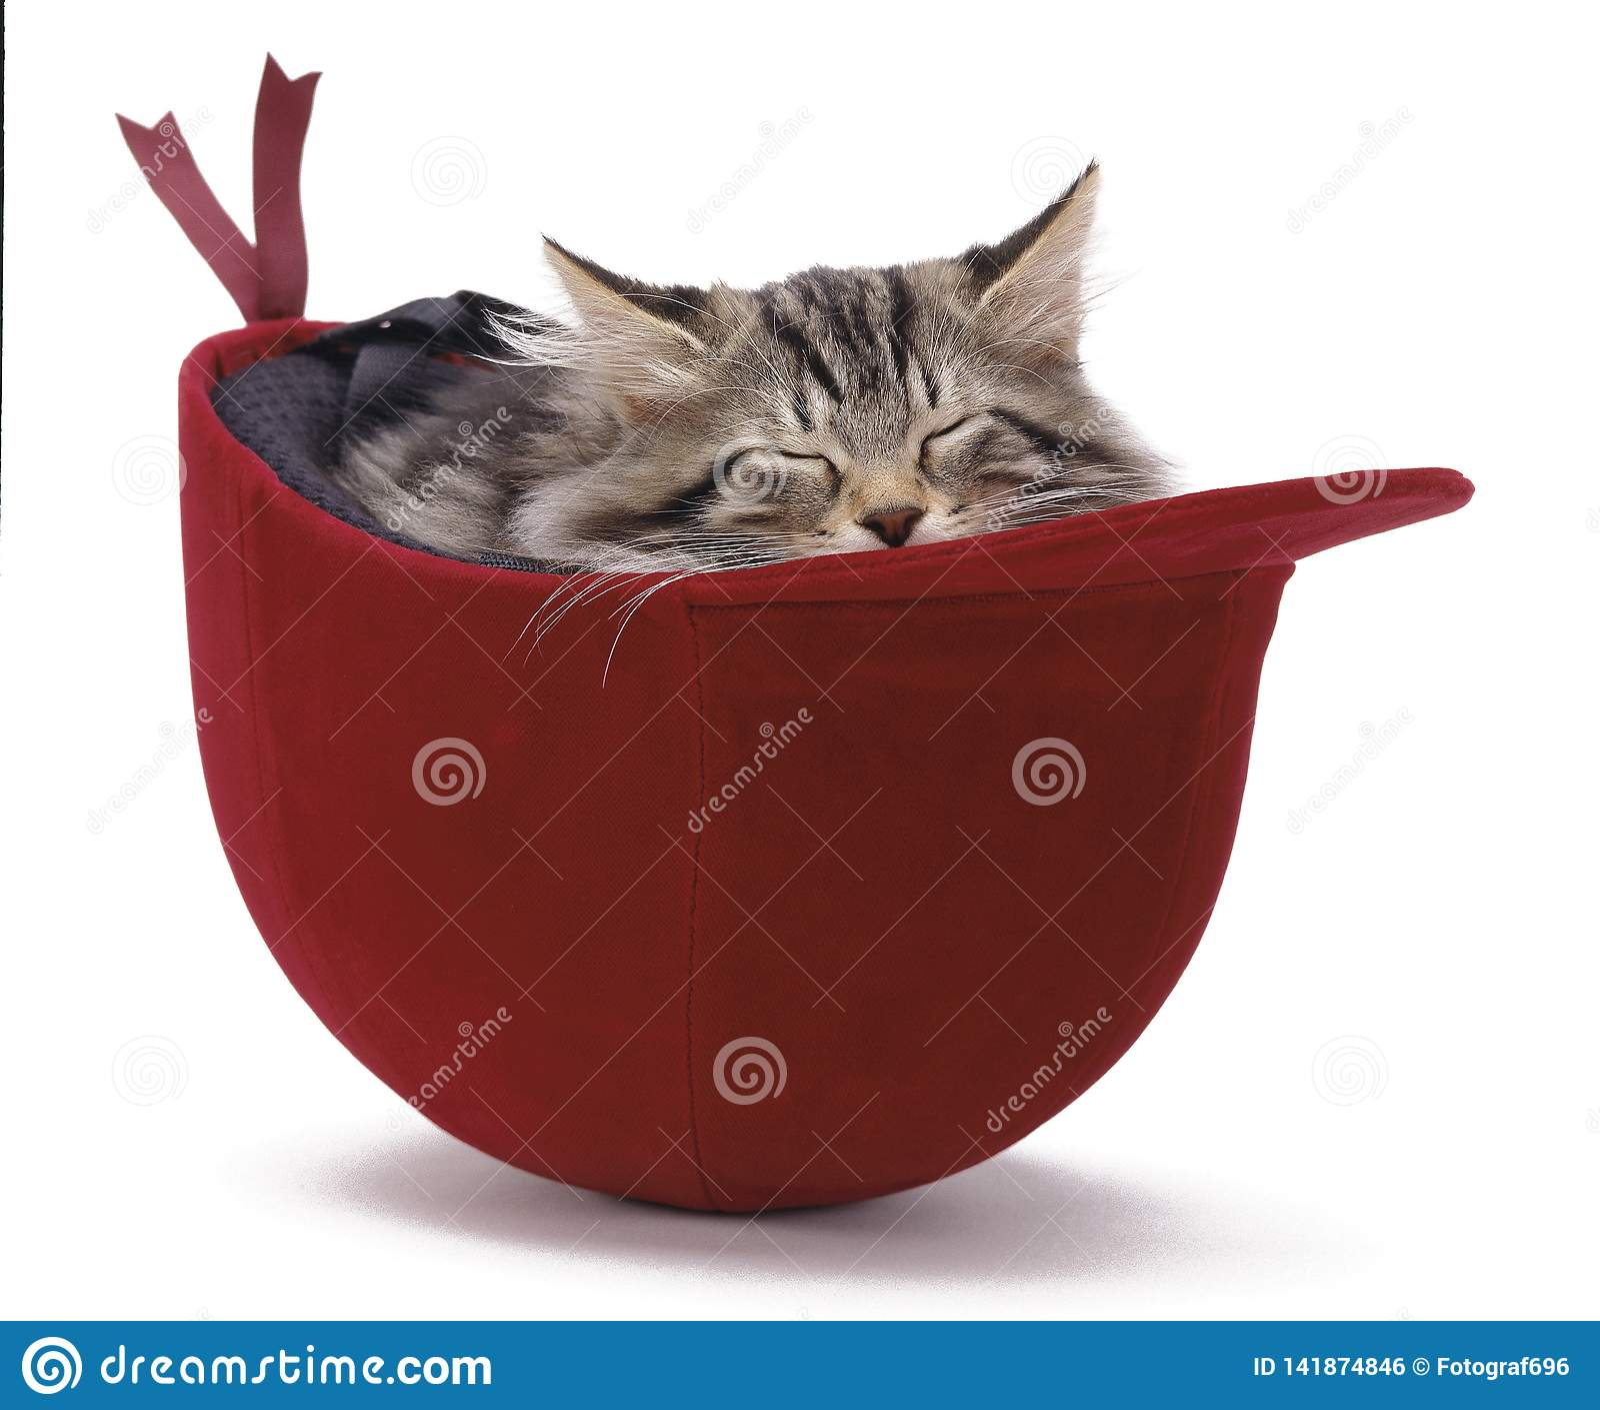 A cat is sleeping in a helmet.